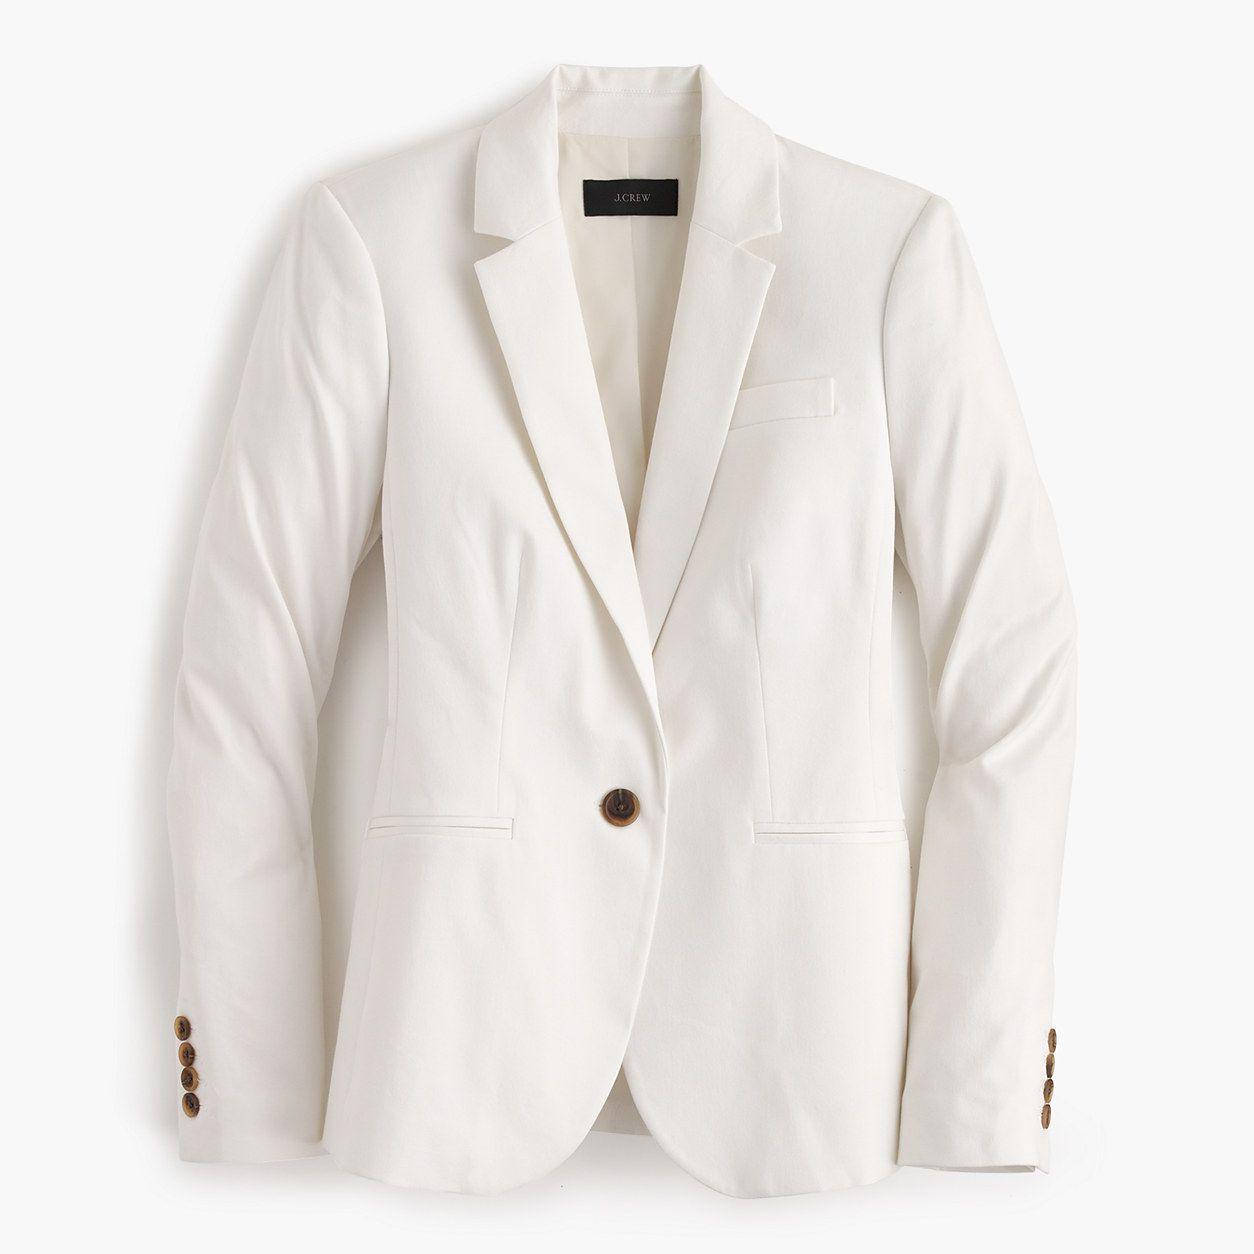 J.Crew Womens Petite Campbell Blazer In Bi-Stretch Cotton (Size 12 Petite)